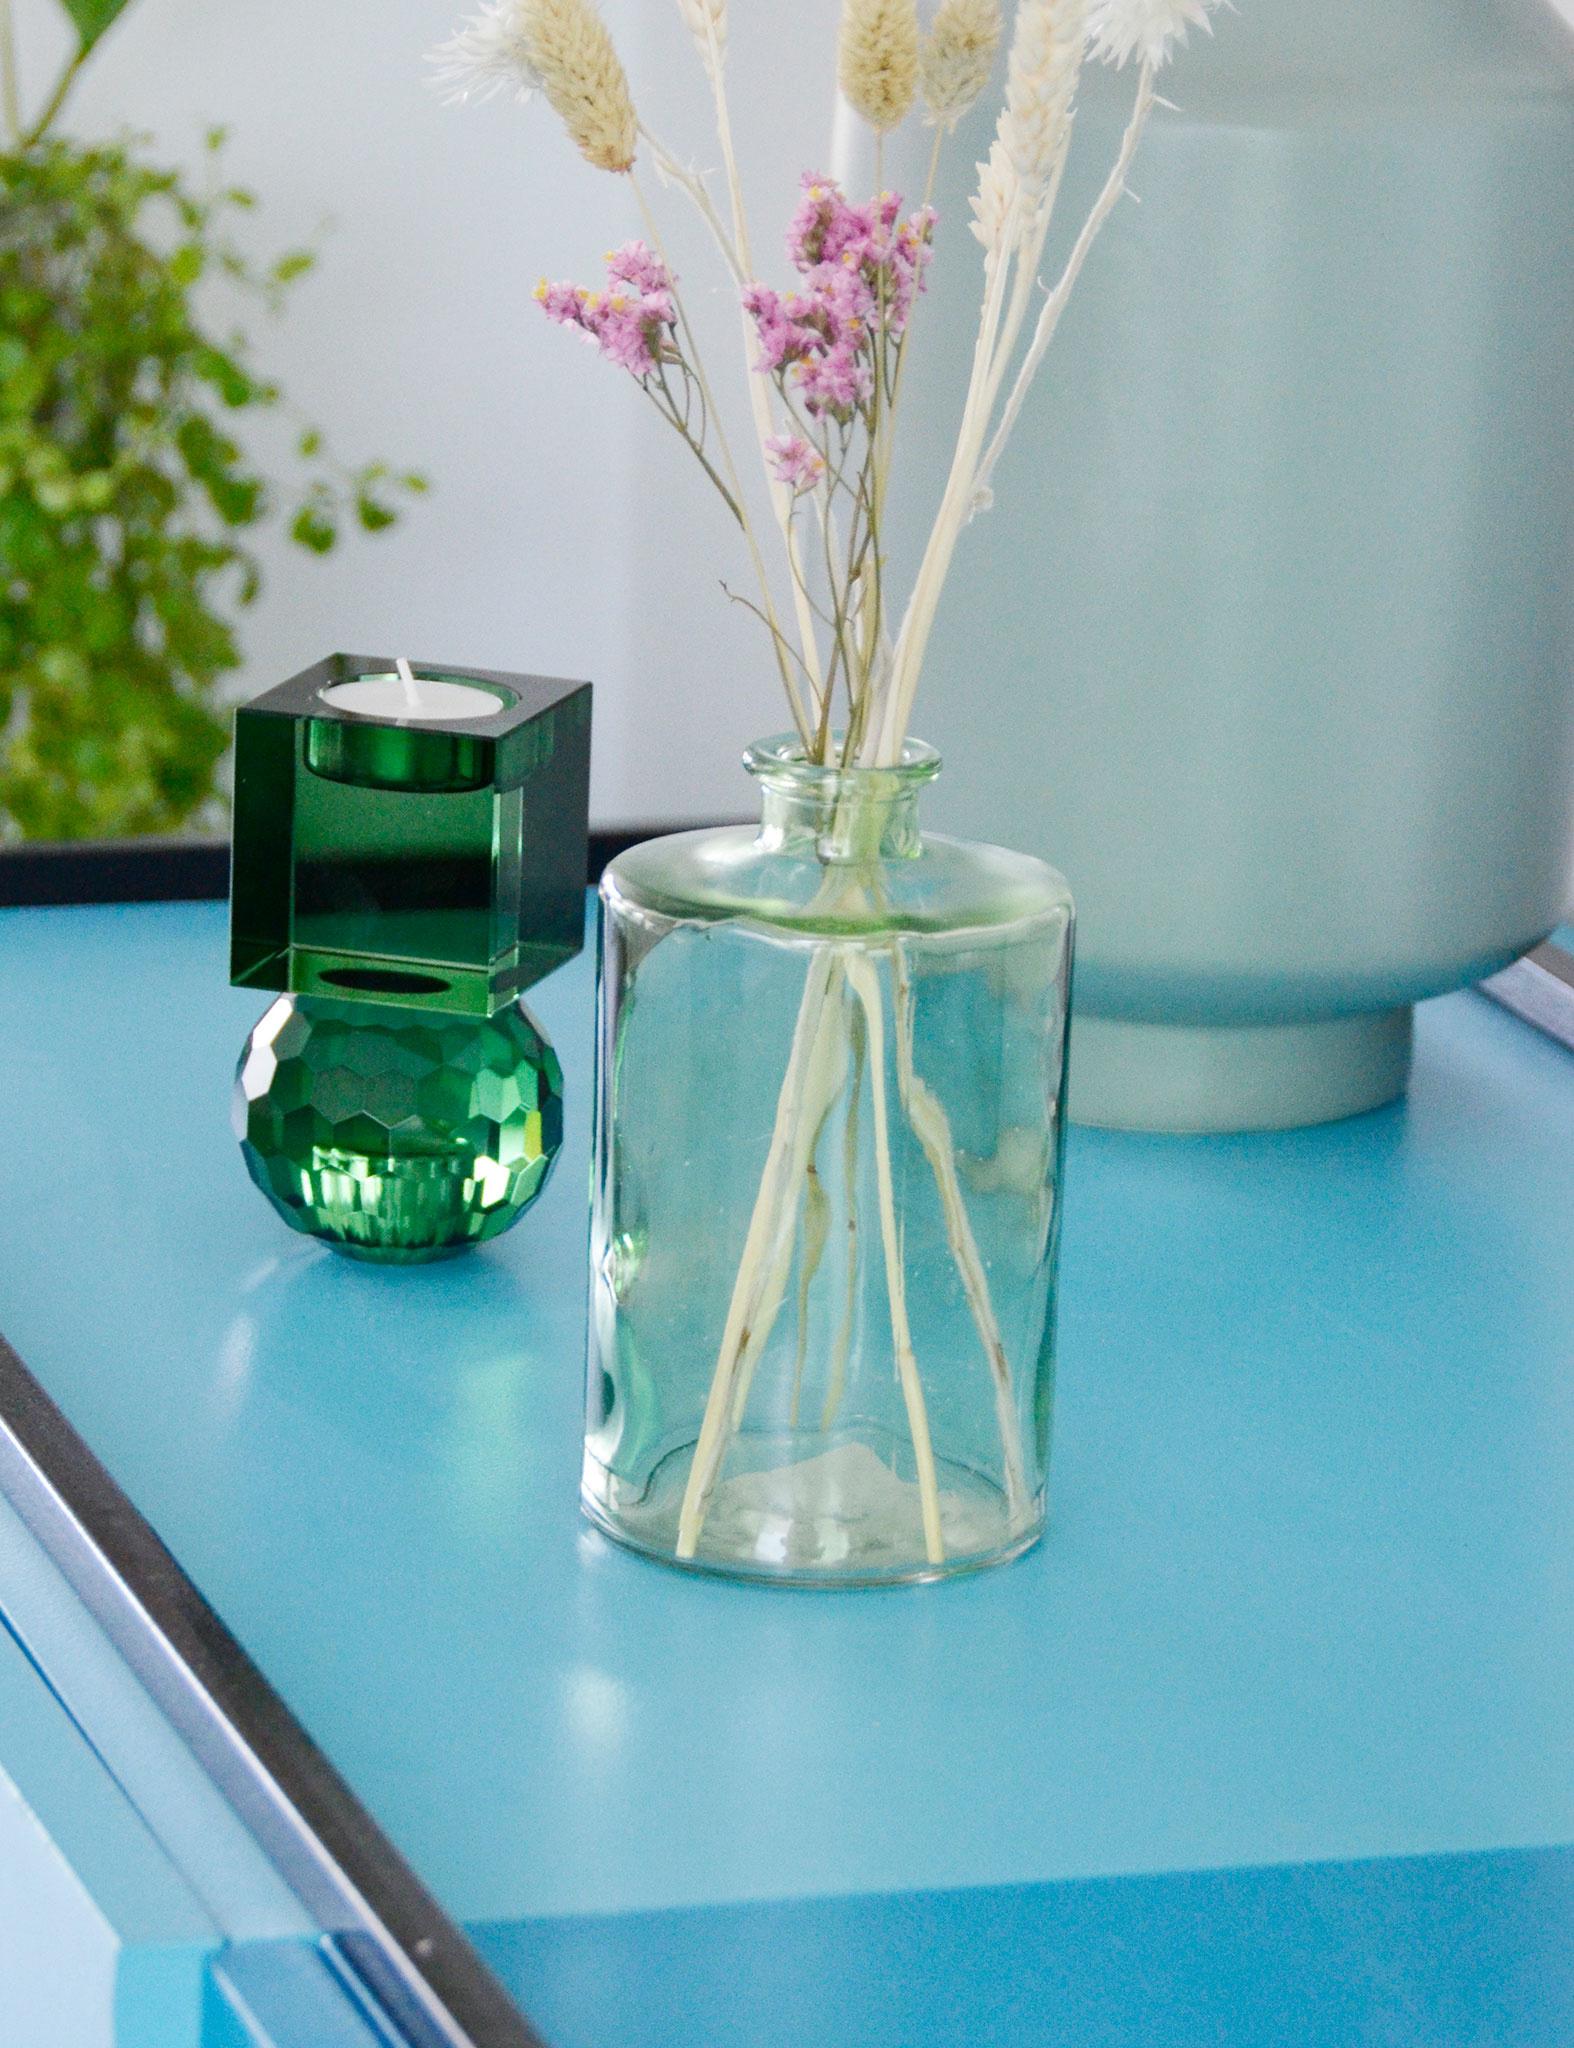 Glazen groene bloemenvaas